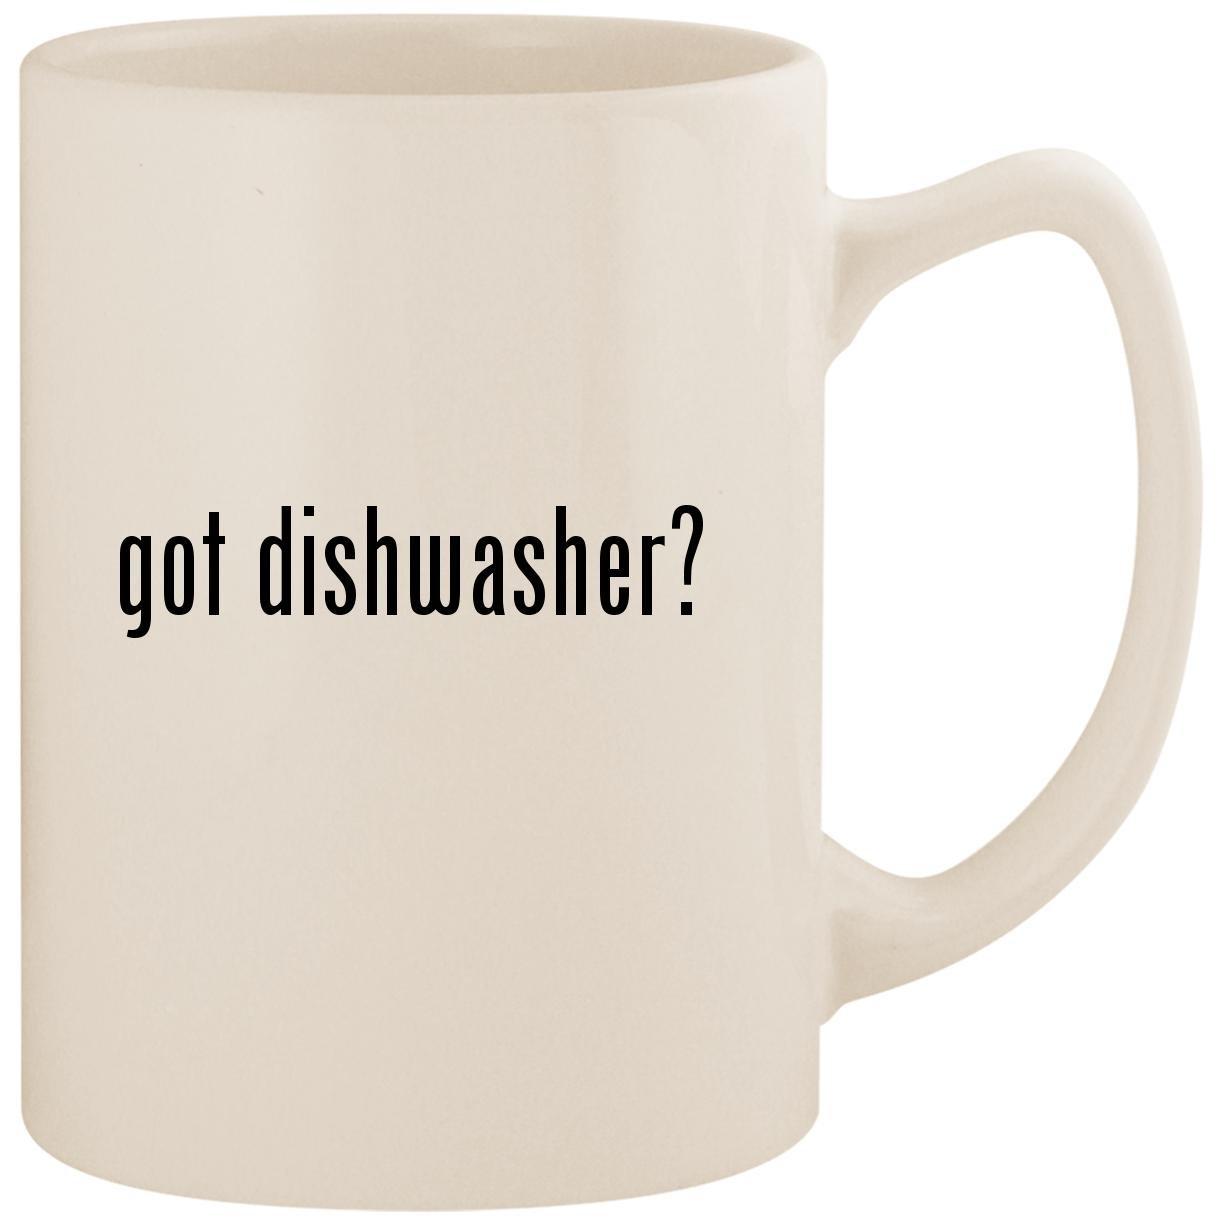 got dishwasher? - White 14oz Ceramic Statesman Coffee Mug Cup